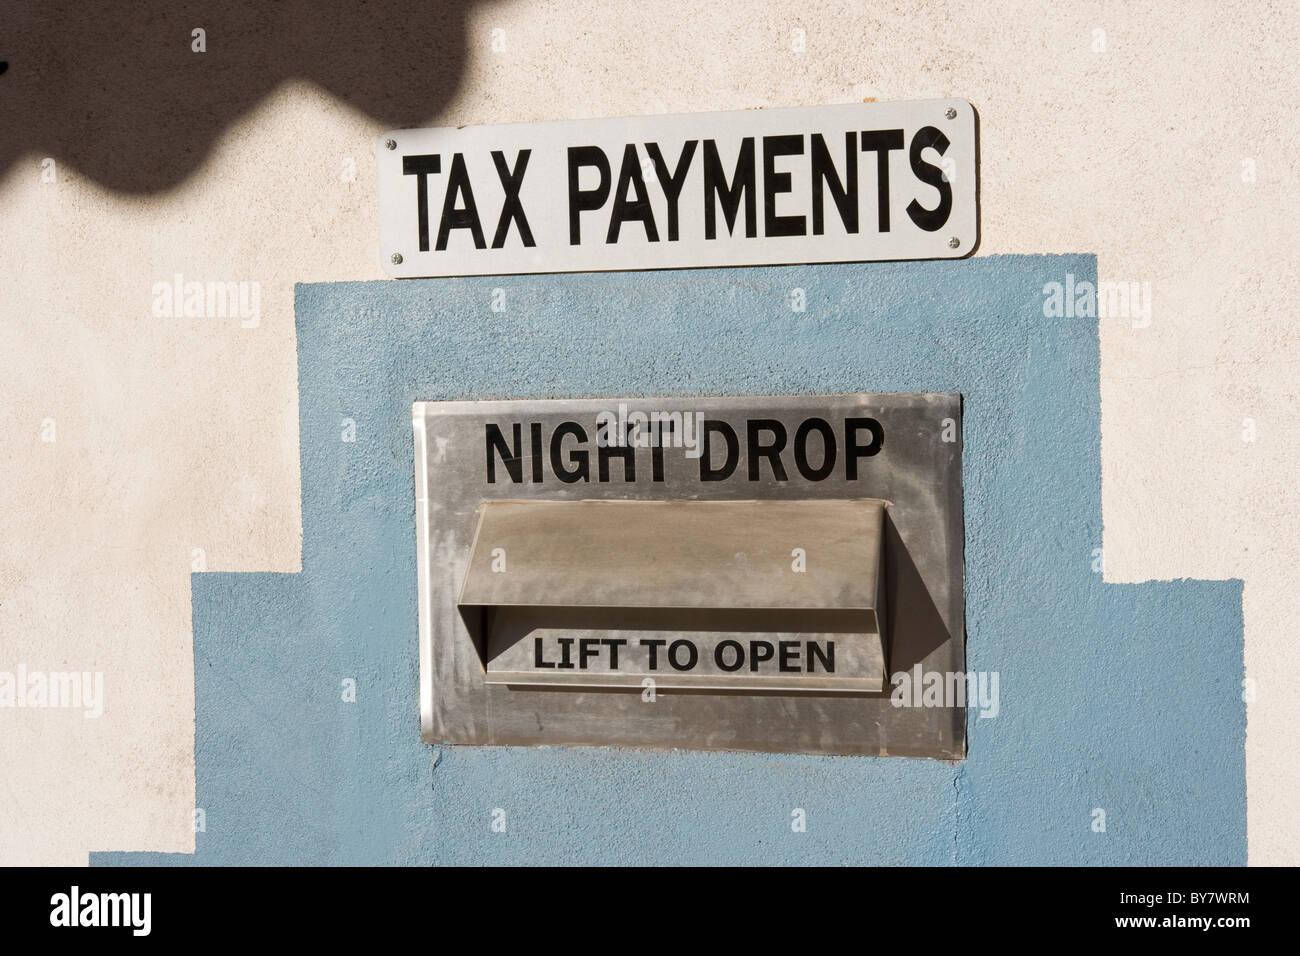 Steuerzahlung drop off-Site, Nacht fallen, New Mexico, USA Stockfoto